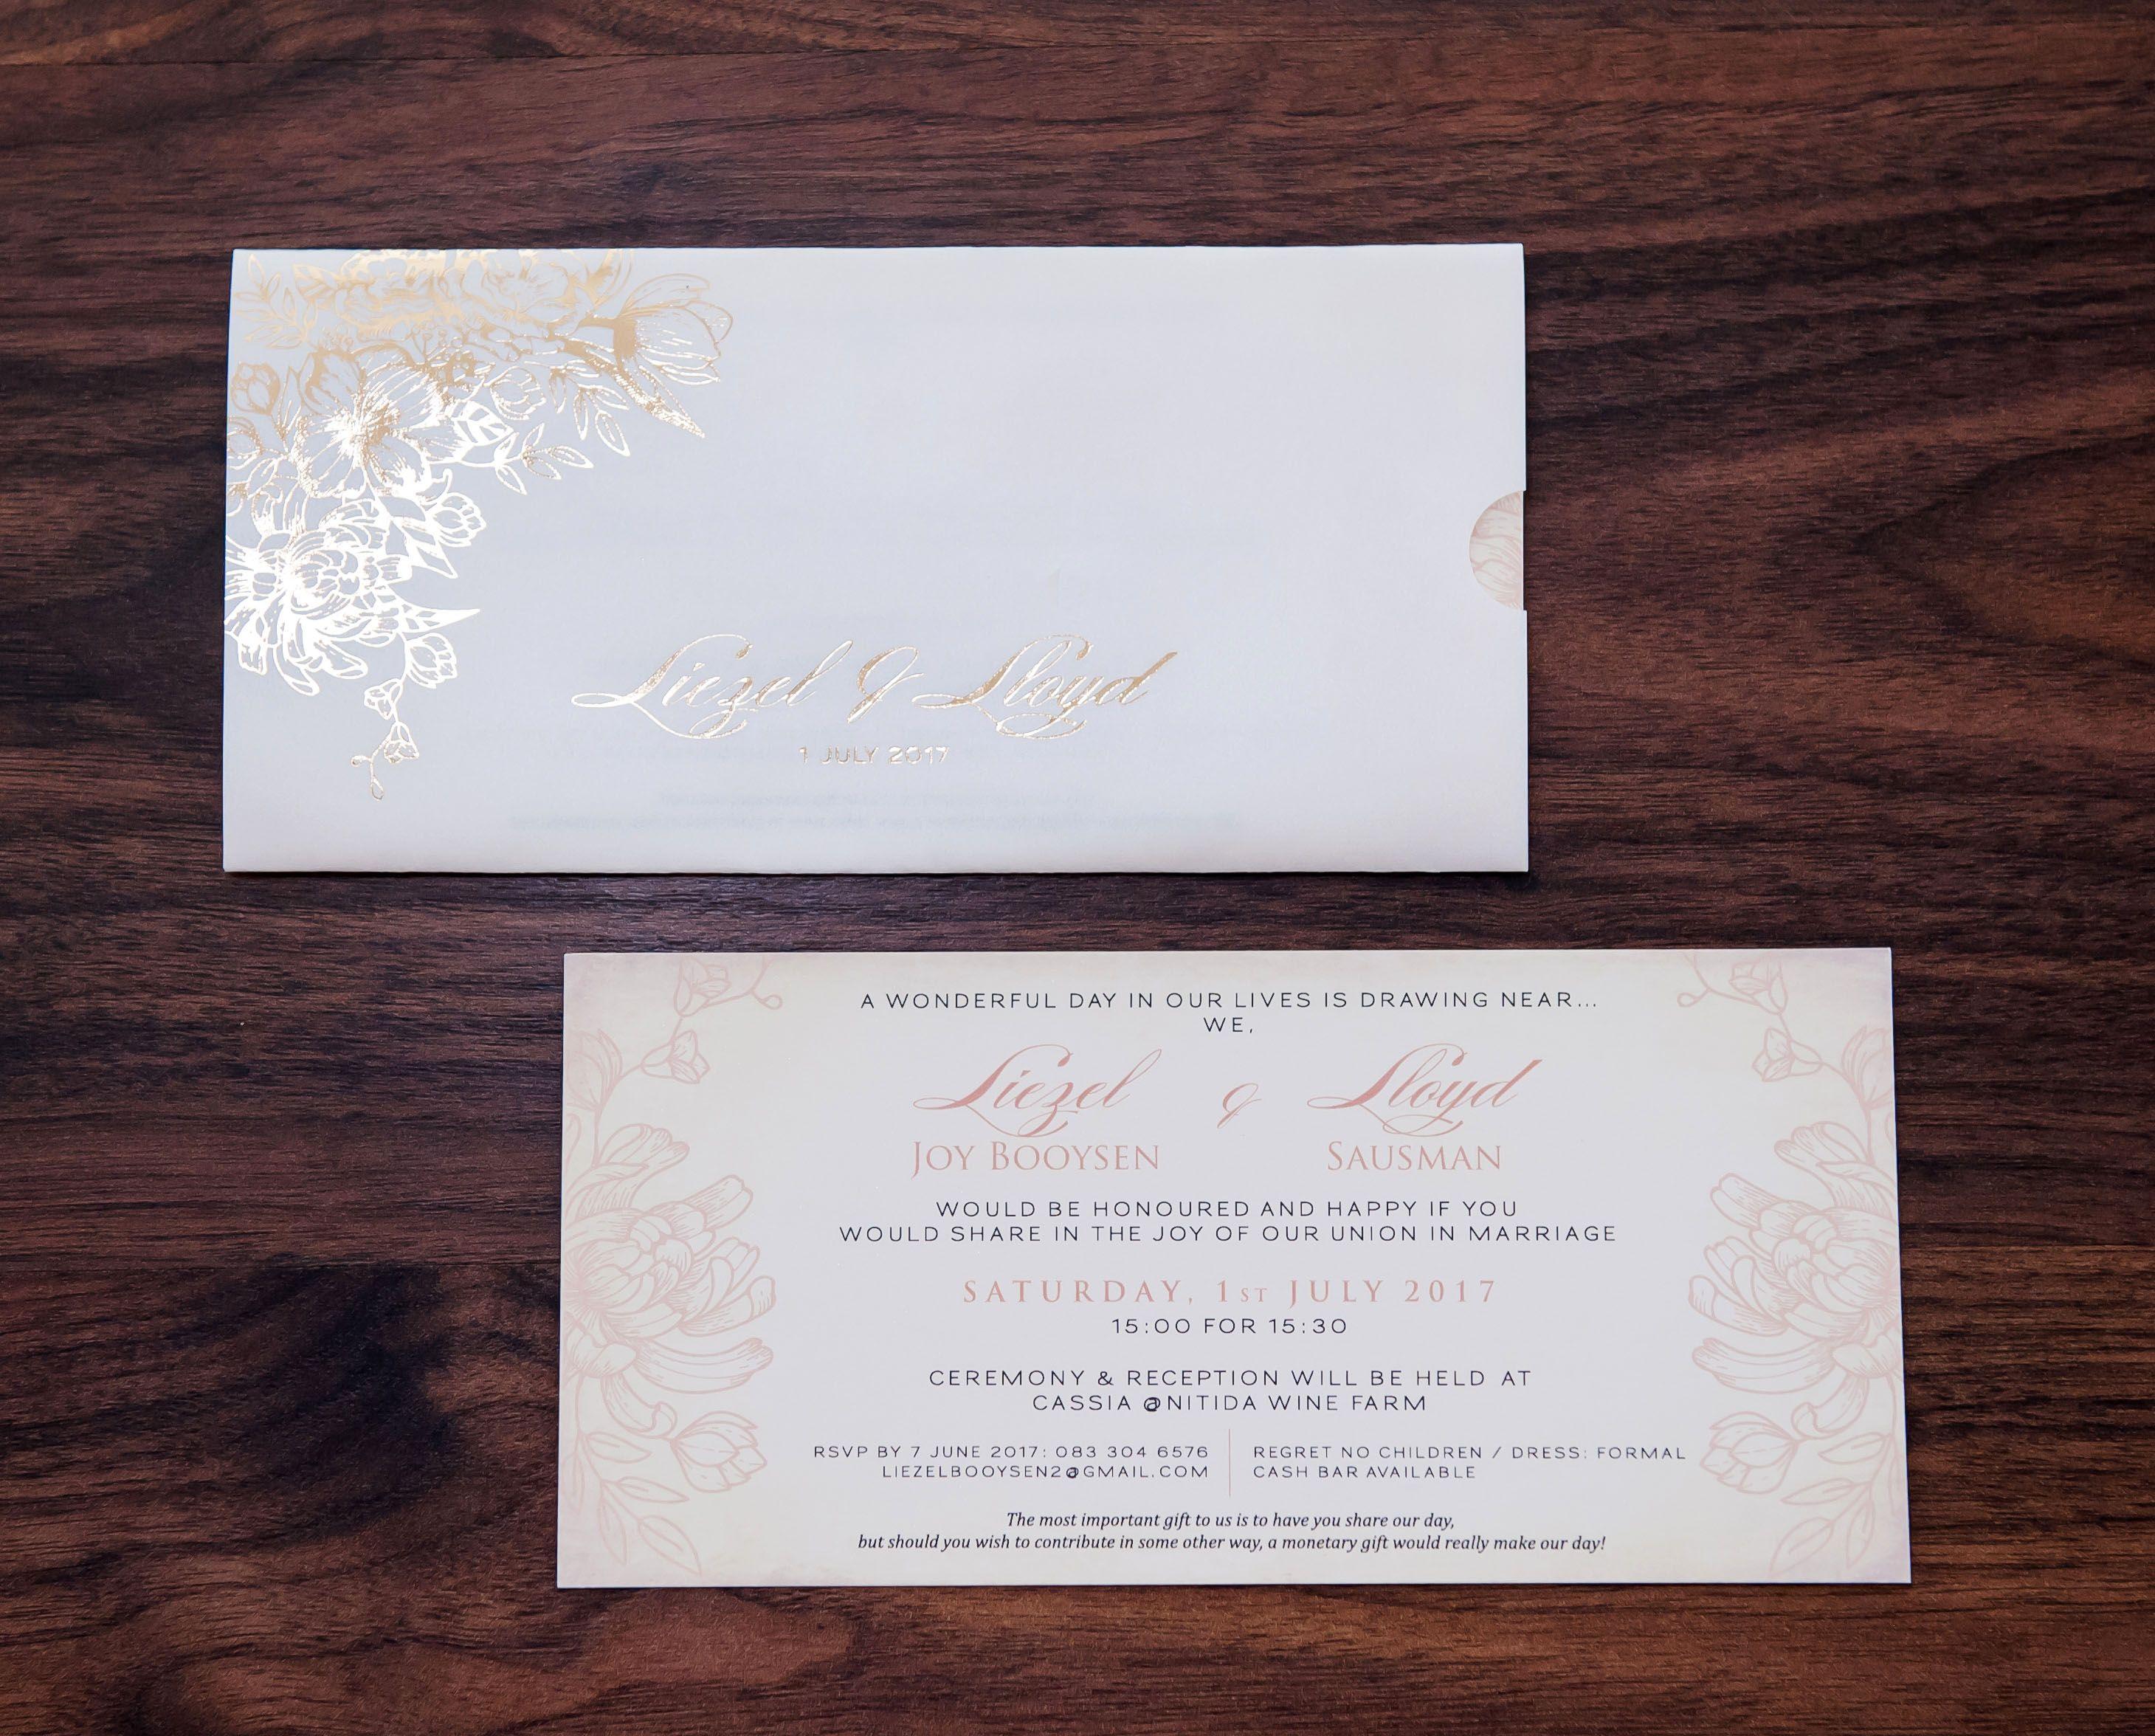 Gold foil floral trace sleeve wedding invitation | Metallic Foiled ...